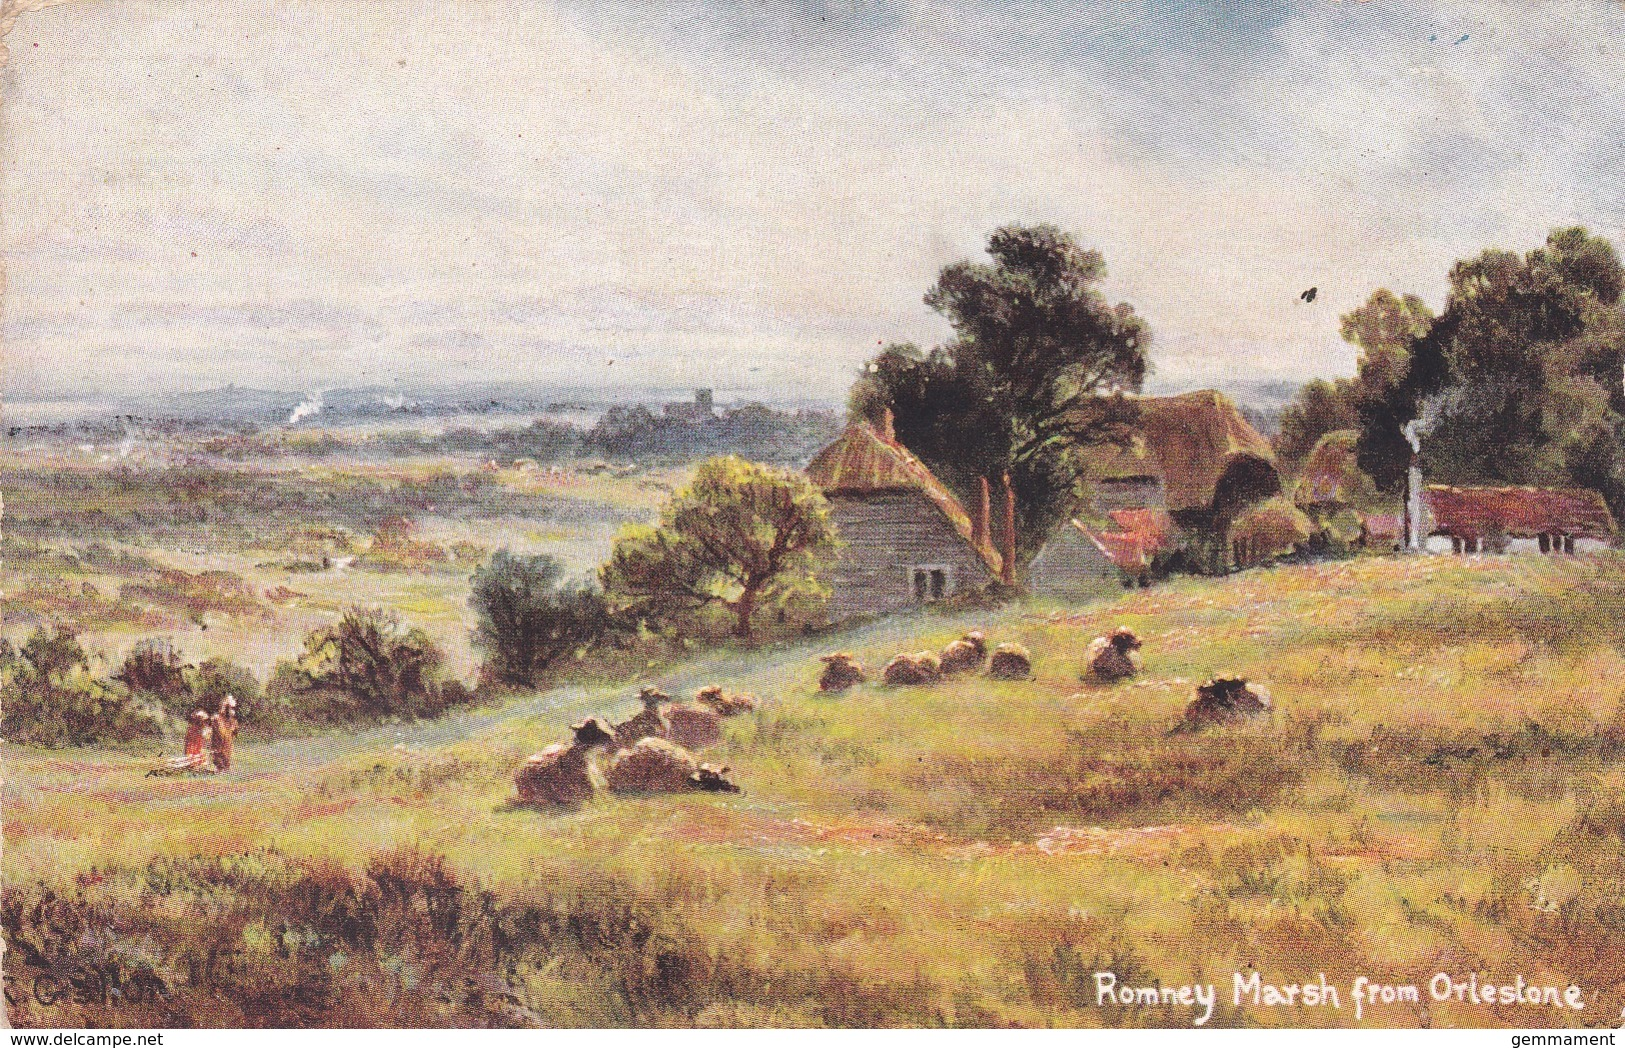 ROMNEY MARSH FROM ORLESTONE - England